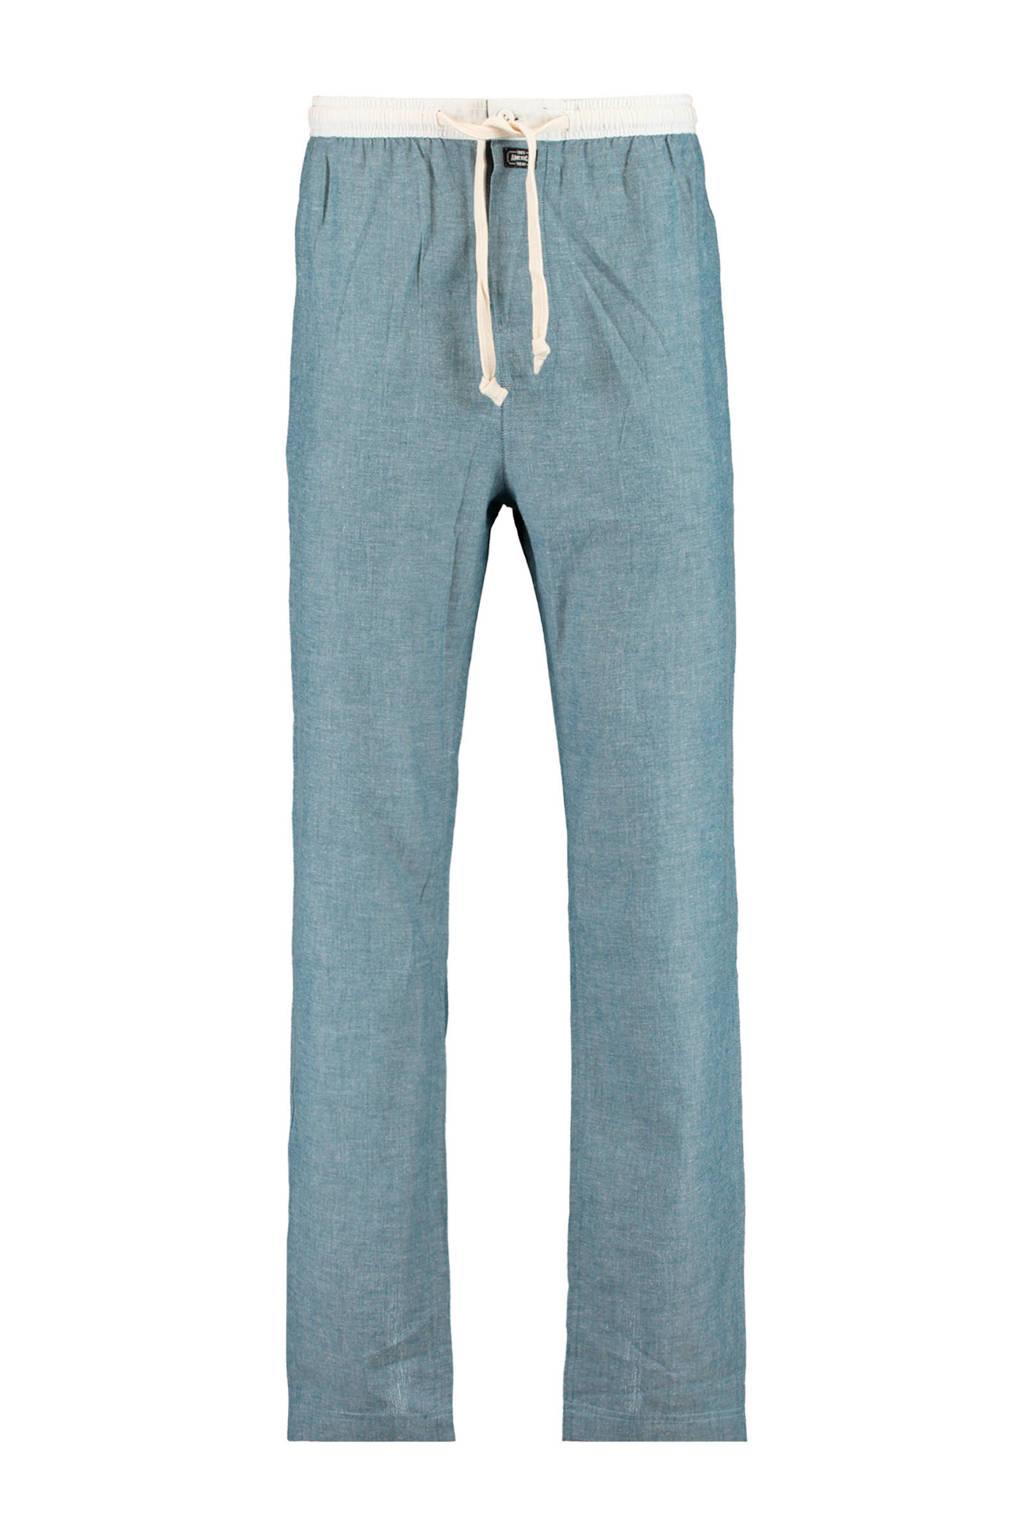 America Today pyjamabroek Lake lichtblauw, Lichtblauw